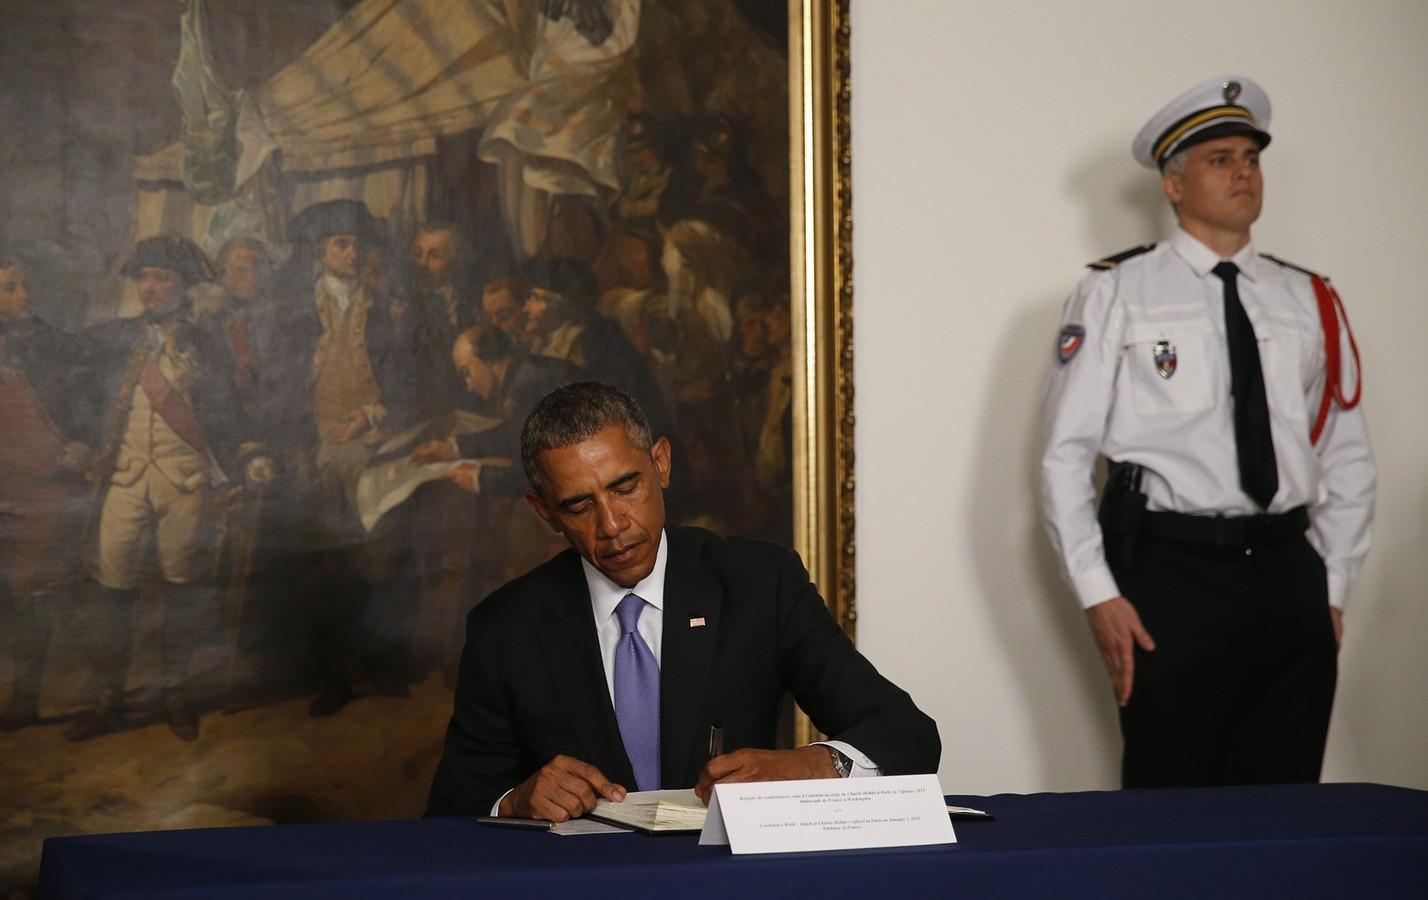 De Amerikaanse president Barack Obama tekent het condoleanceregister op de Franse ambassade in Washington